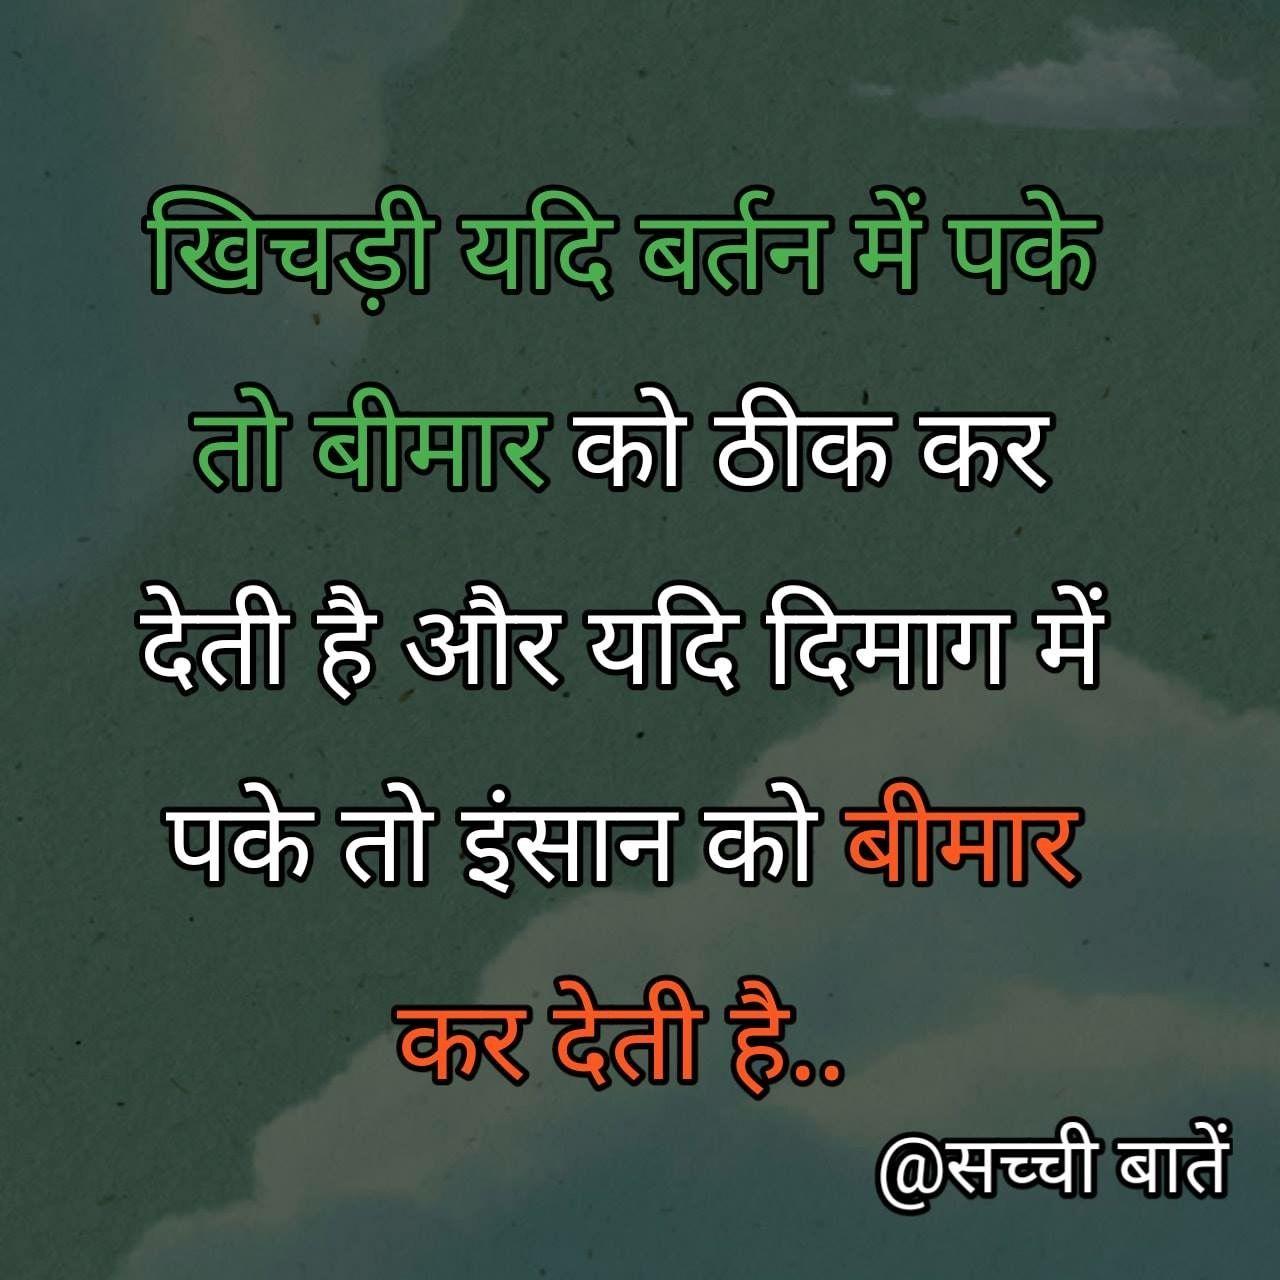 Pin by Sharad Kaushik on सच्ची बातें Inspirational